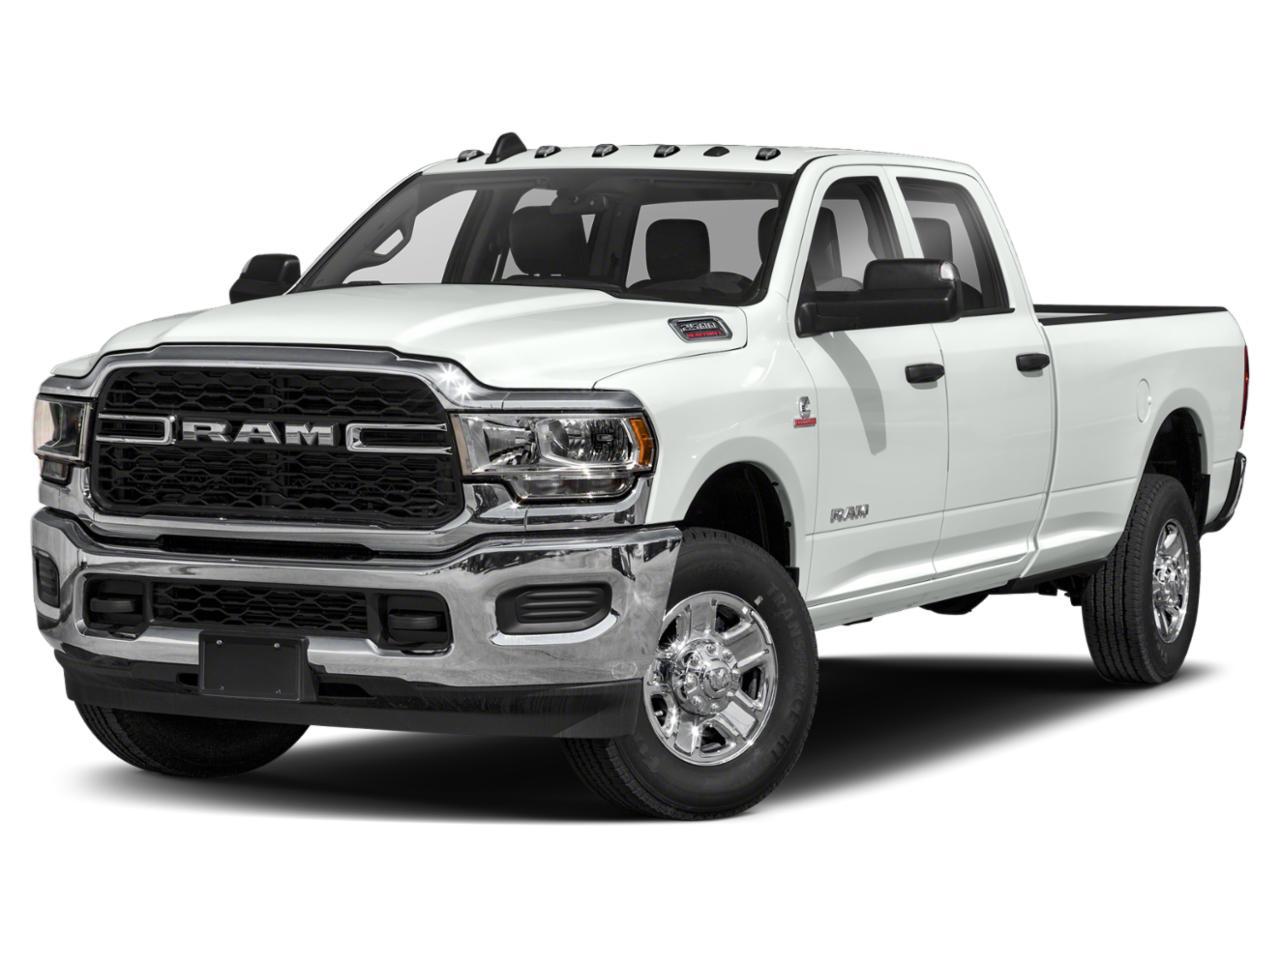 2020 Ram 2500 Vehicle Photo in San Antonio, TX 78238